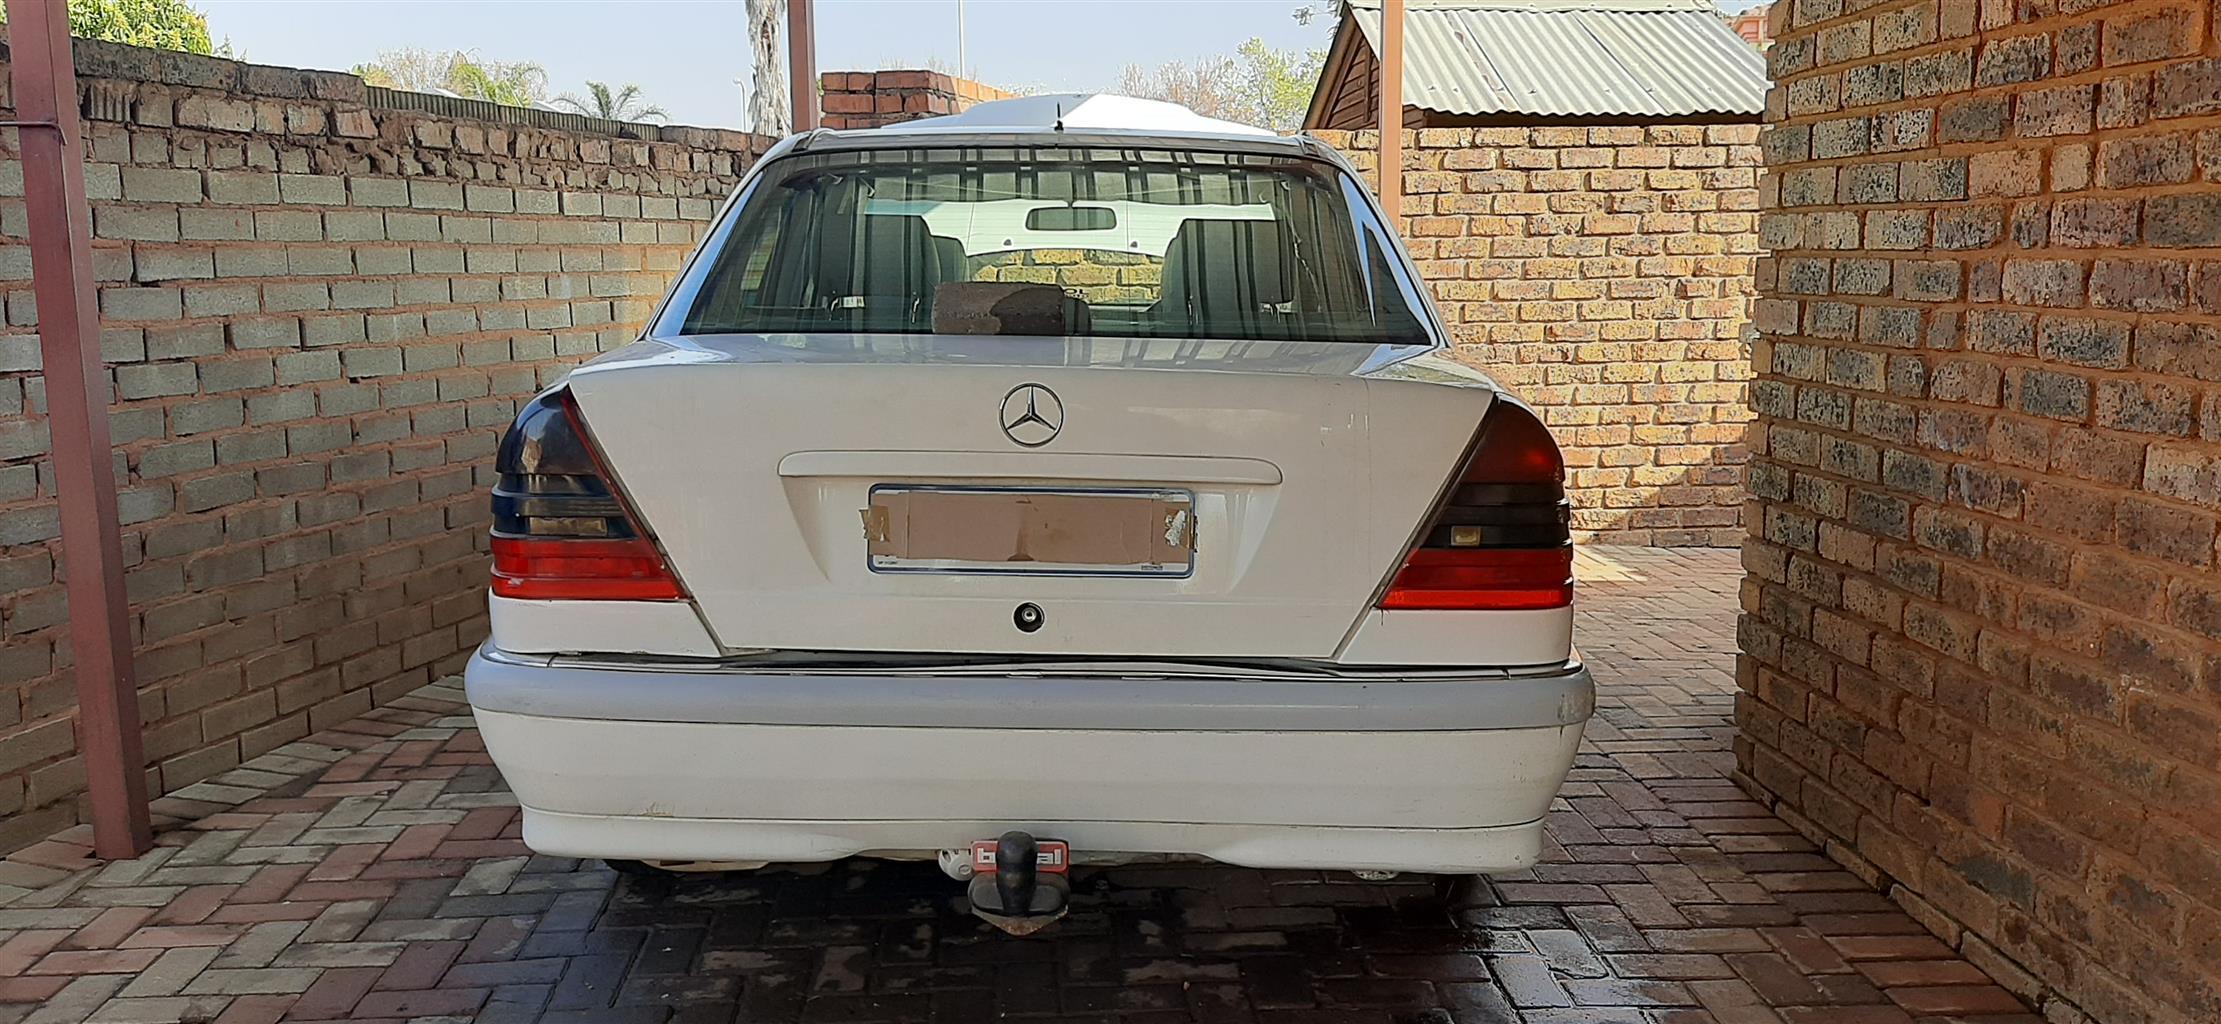 1996 Mercedes Benz C Class C200 Edition C Junk Mail